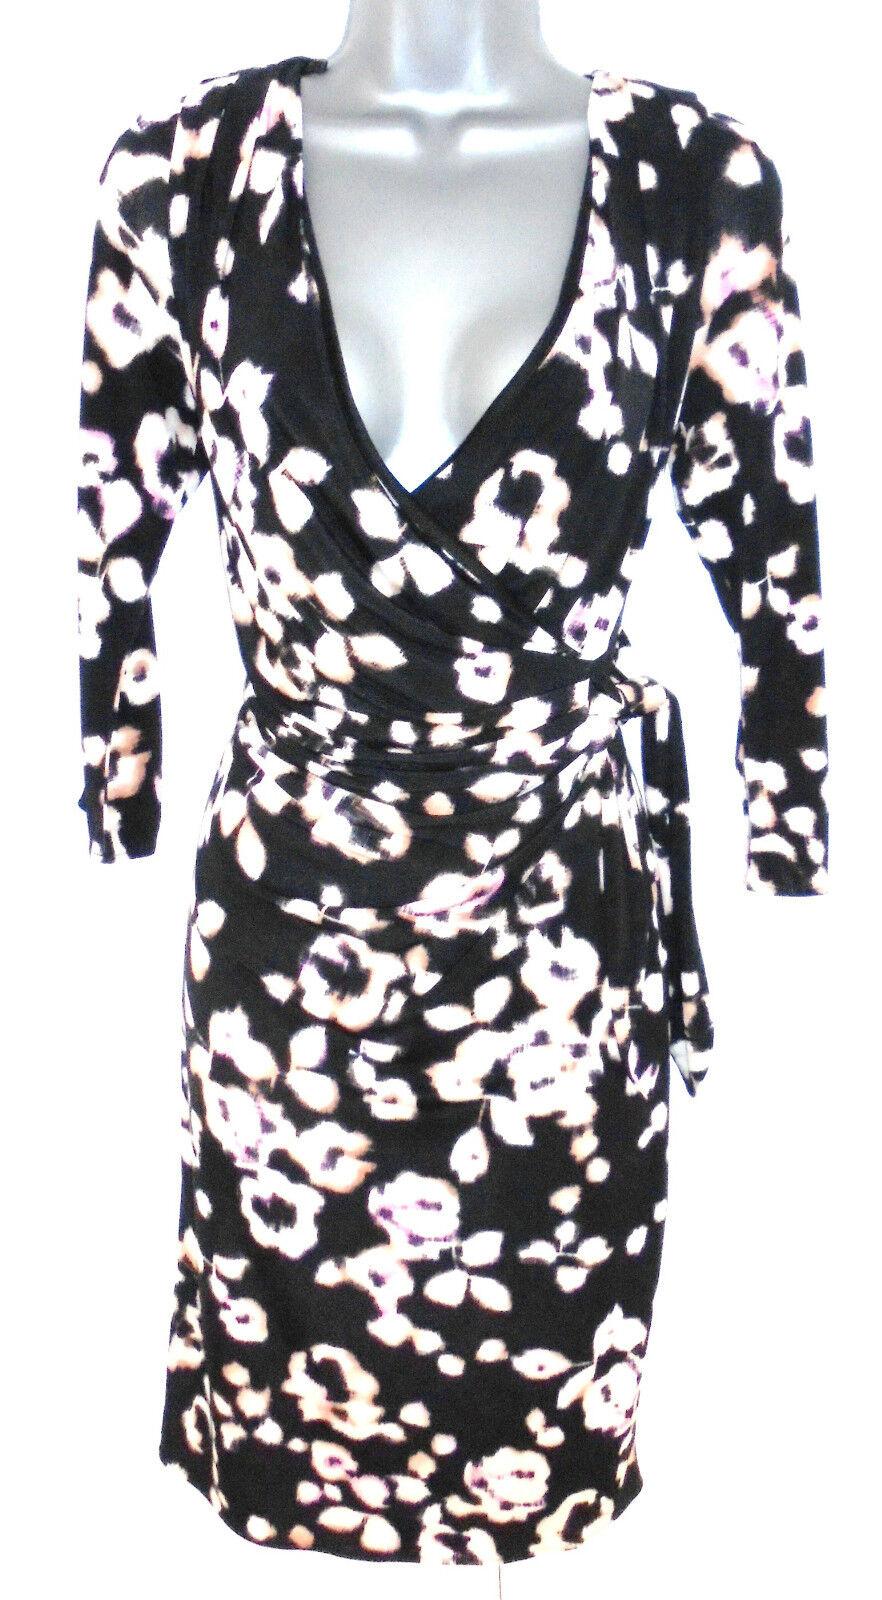 Stunning Coast Blaur Floral Print Ruch Mock Wrap Evening Occasion Dress Größe 12